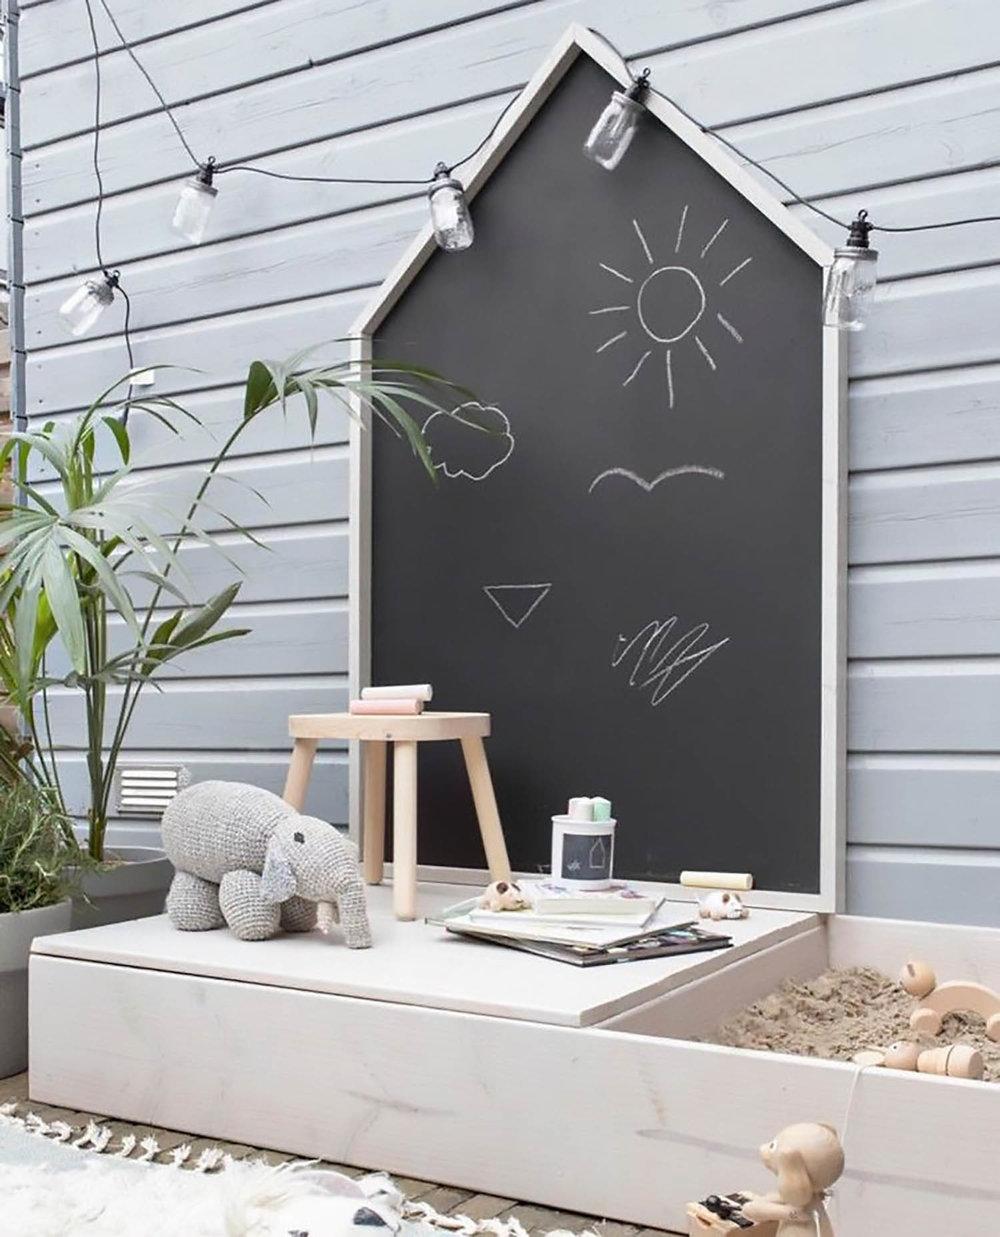 modern house shaped outdoor chalkboard and sandpit for kids